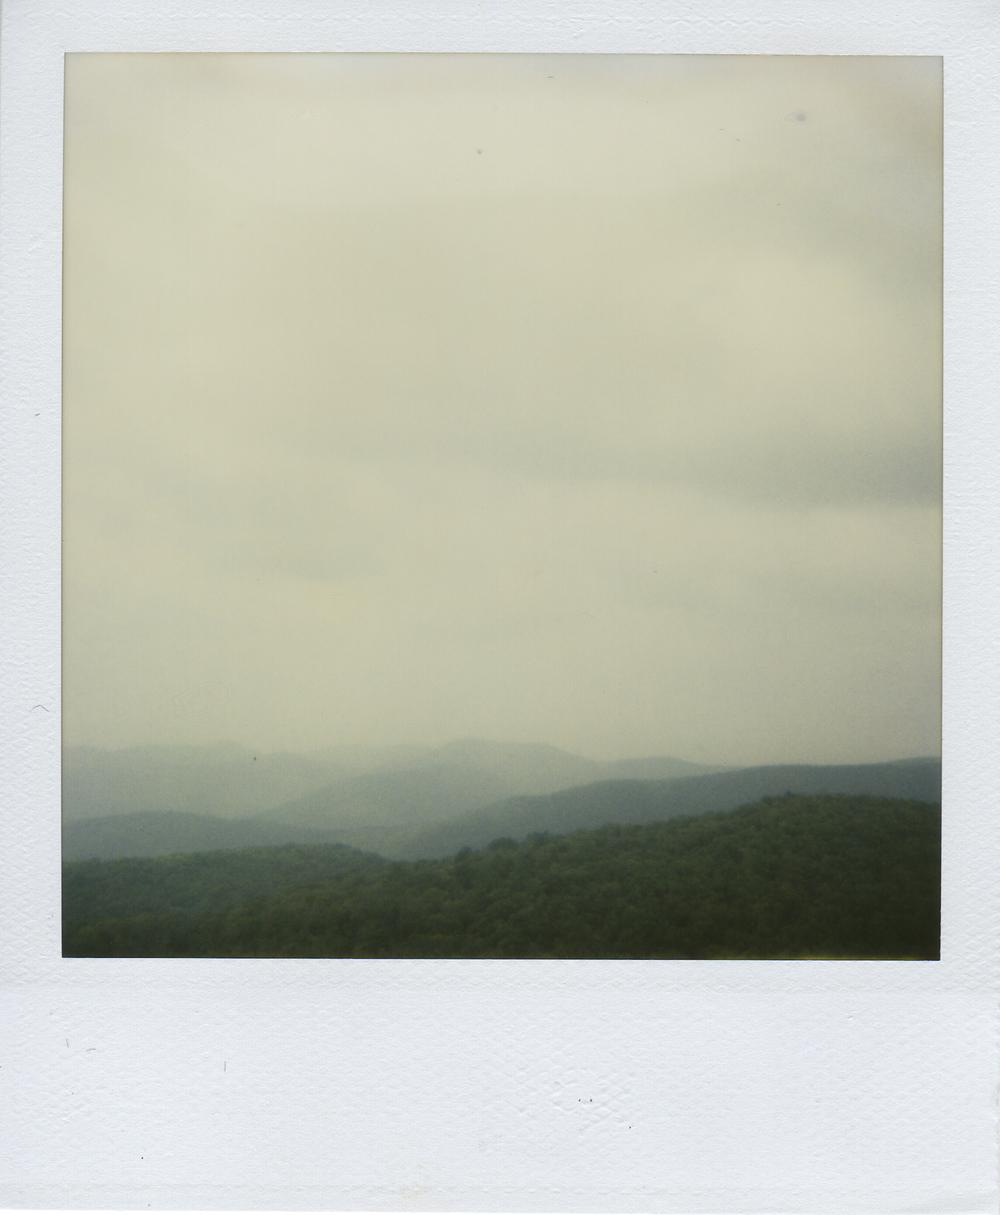 jlaurence-polaroid-028.jpg